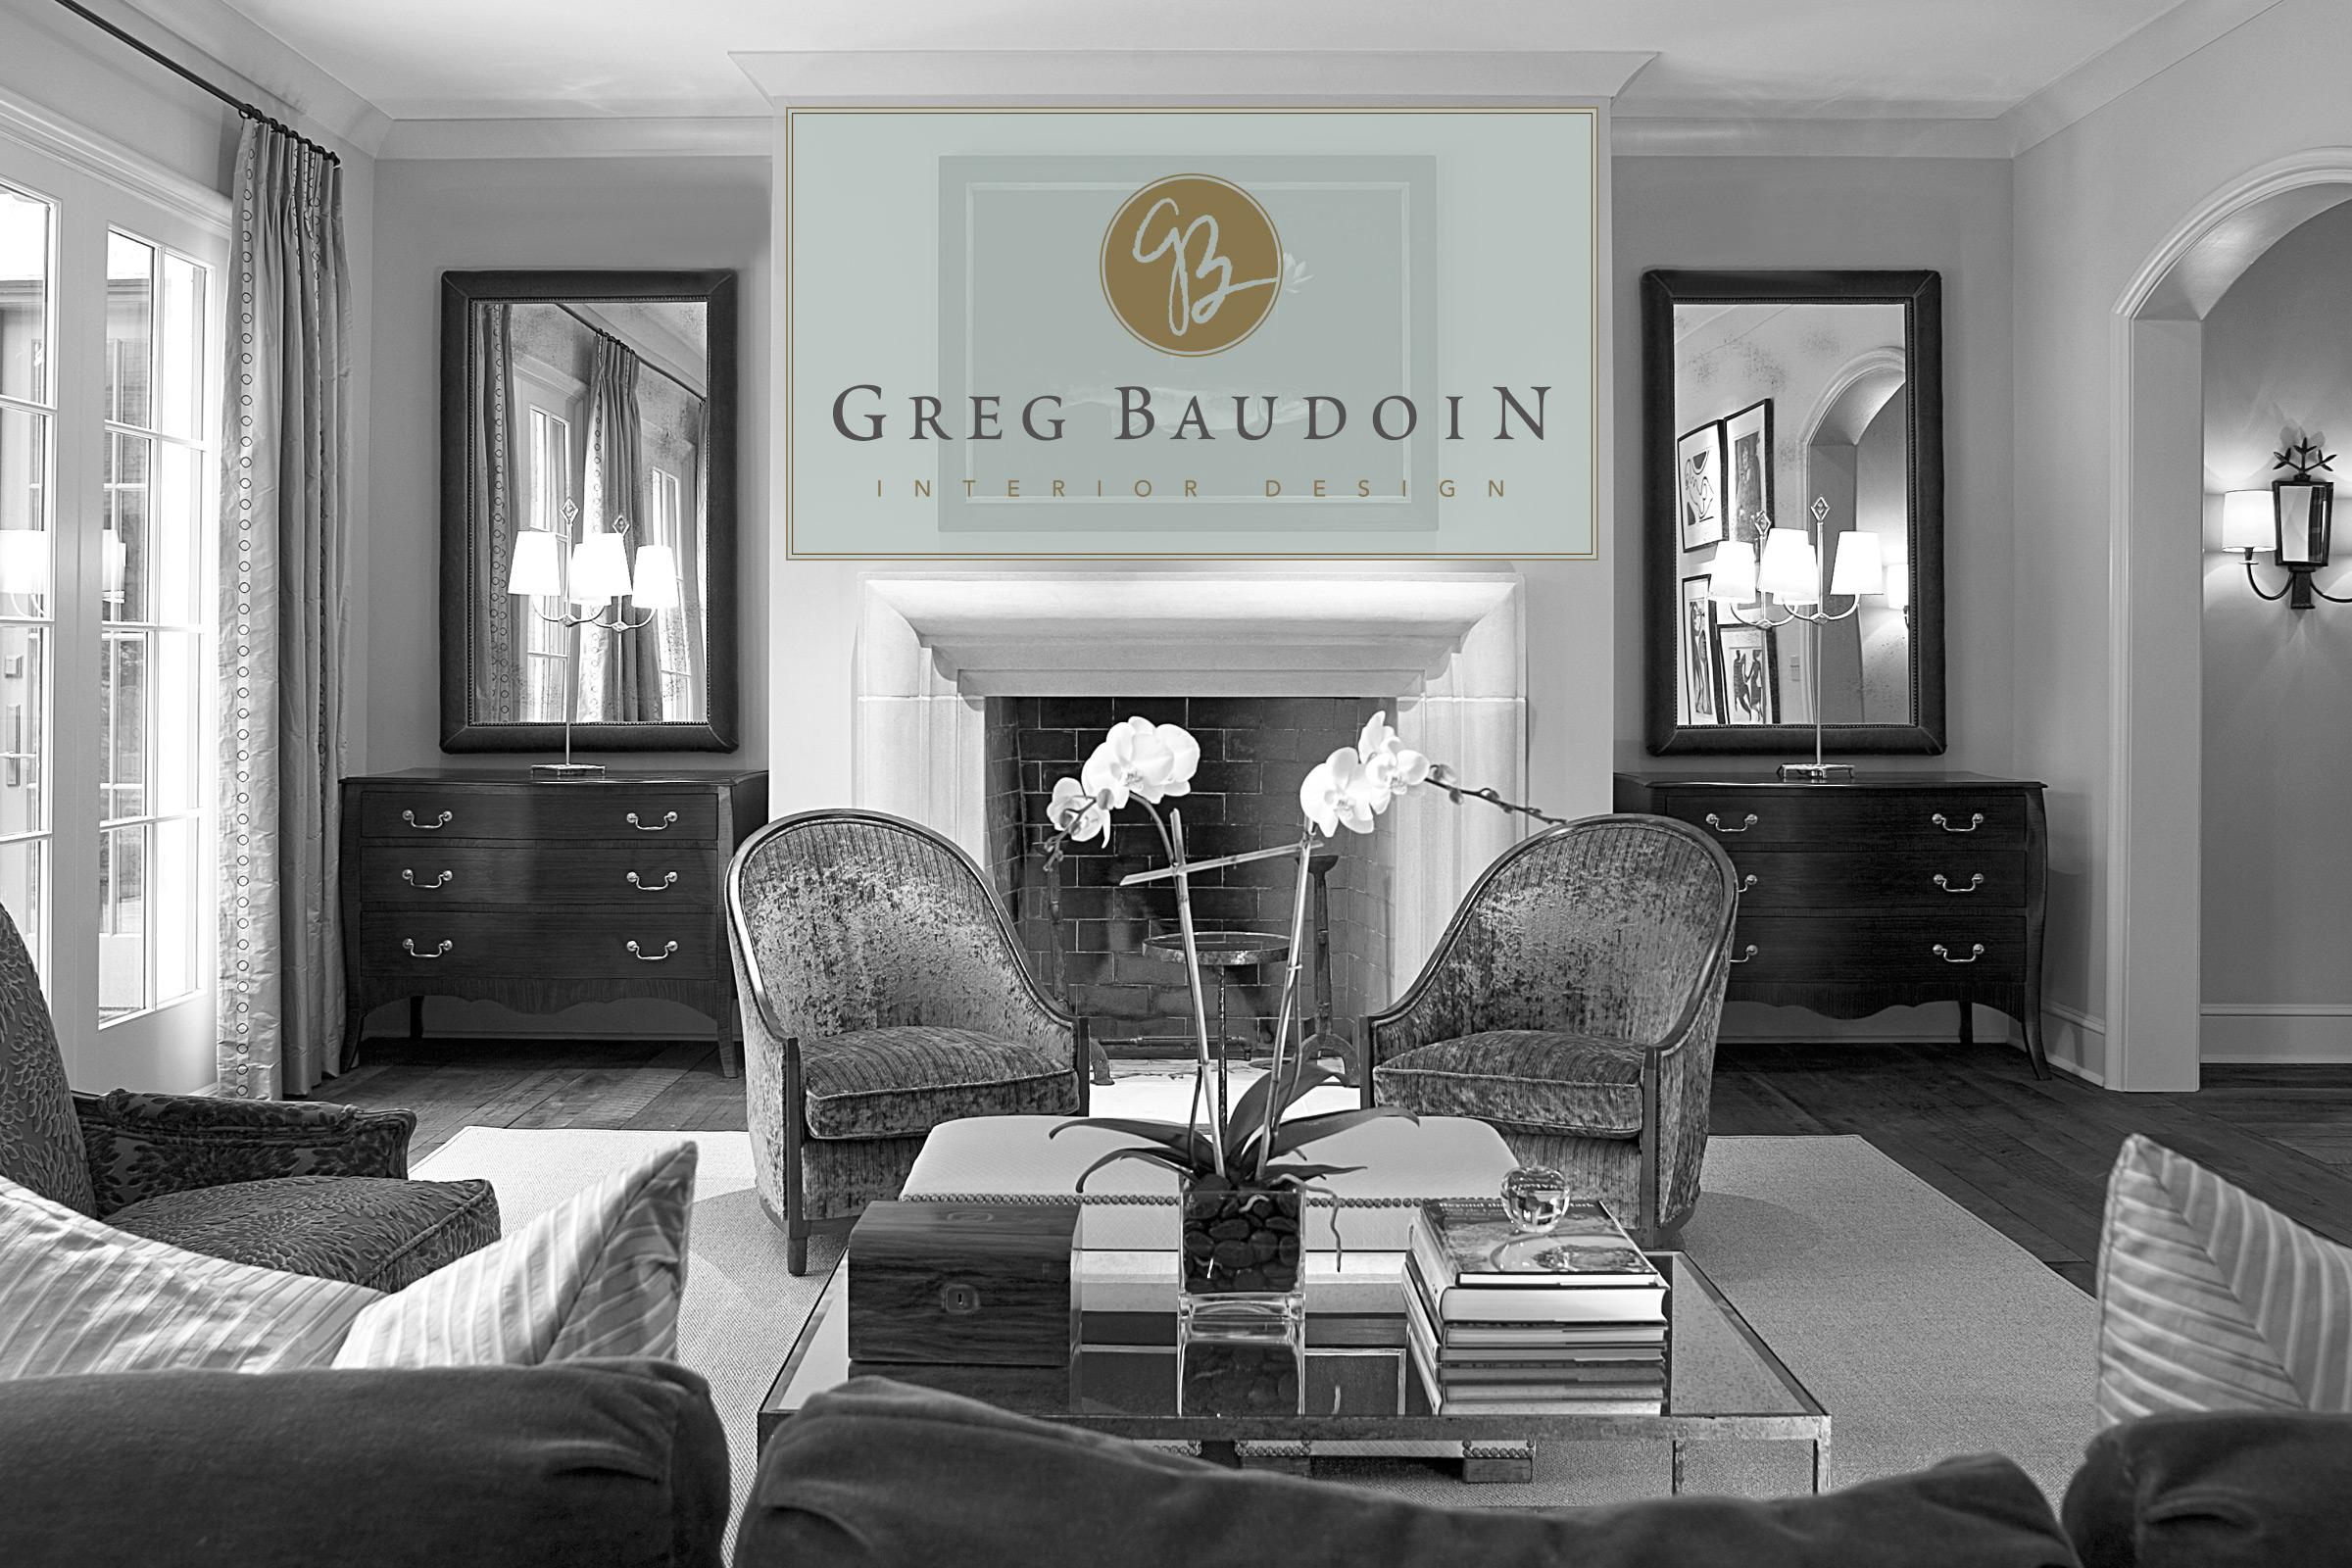 greg baudoin interior design